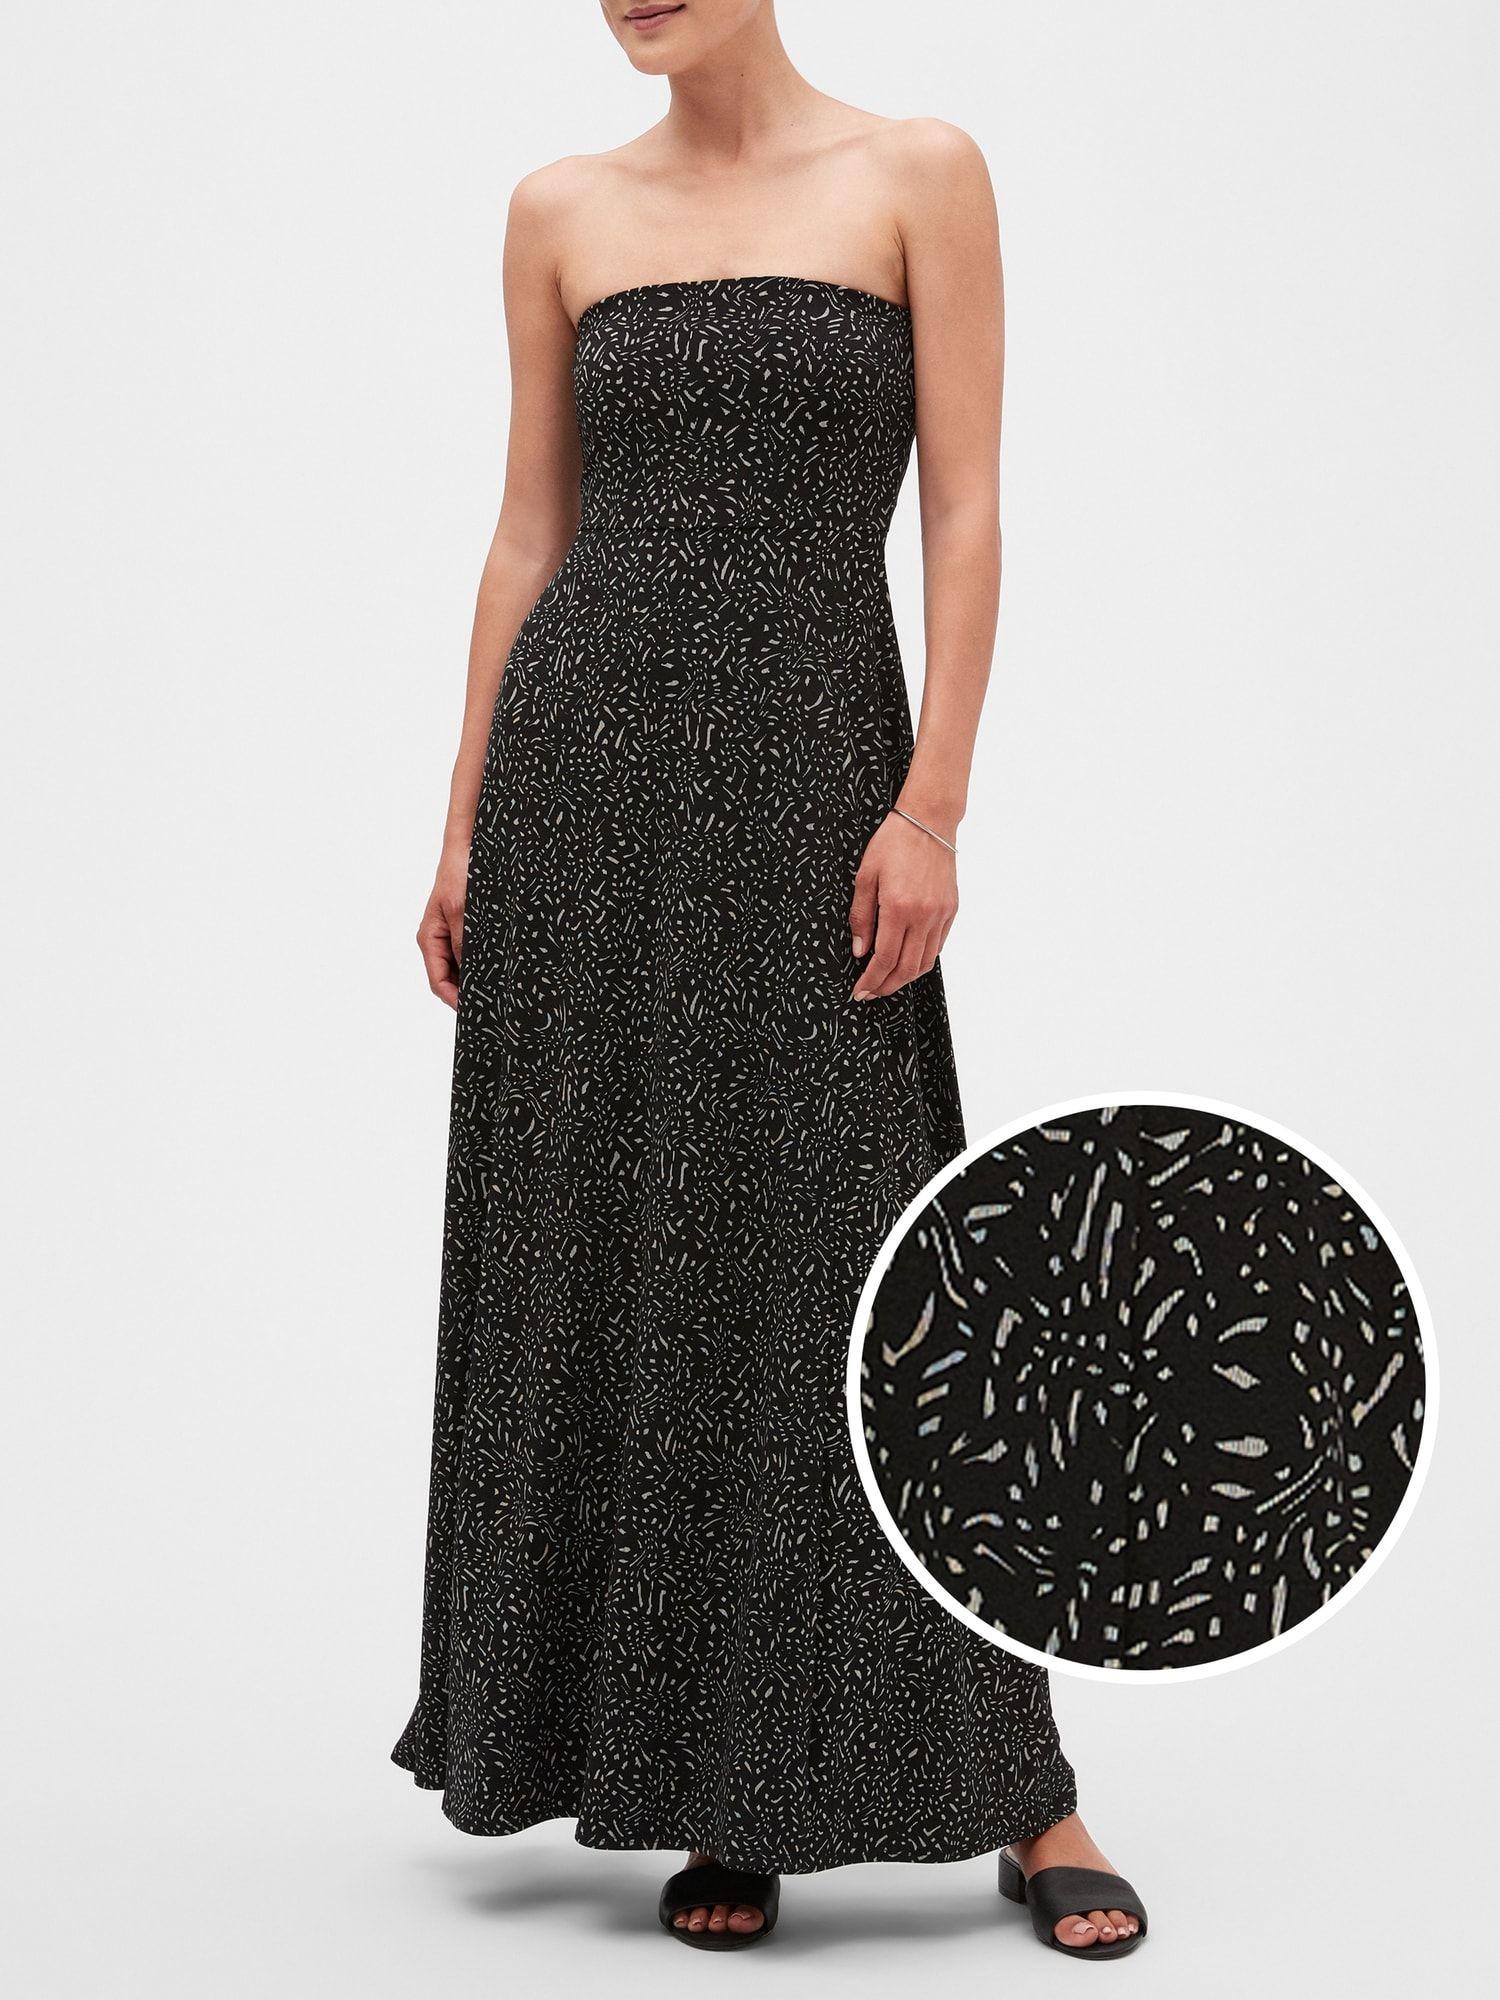 Tube Top Knit Maxi Dress Banana Republic Factory Maxi Knit Dress Strapless Dress Formal Maxi Dress [ 2000 x 1500 Pixel ]